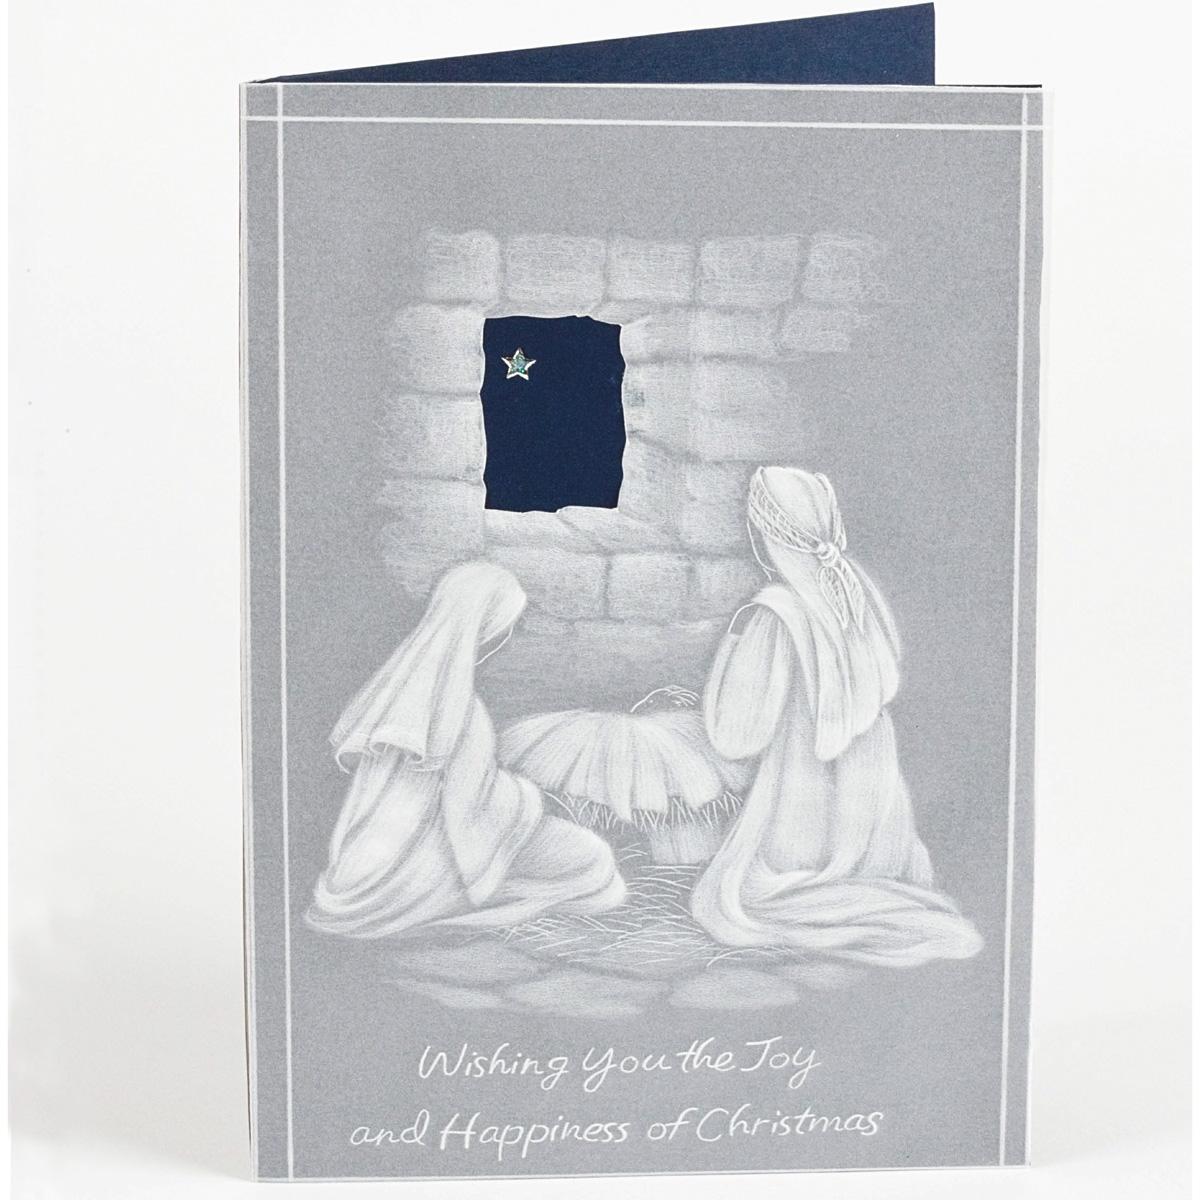 Good-tidings-Christmas-card